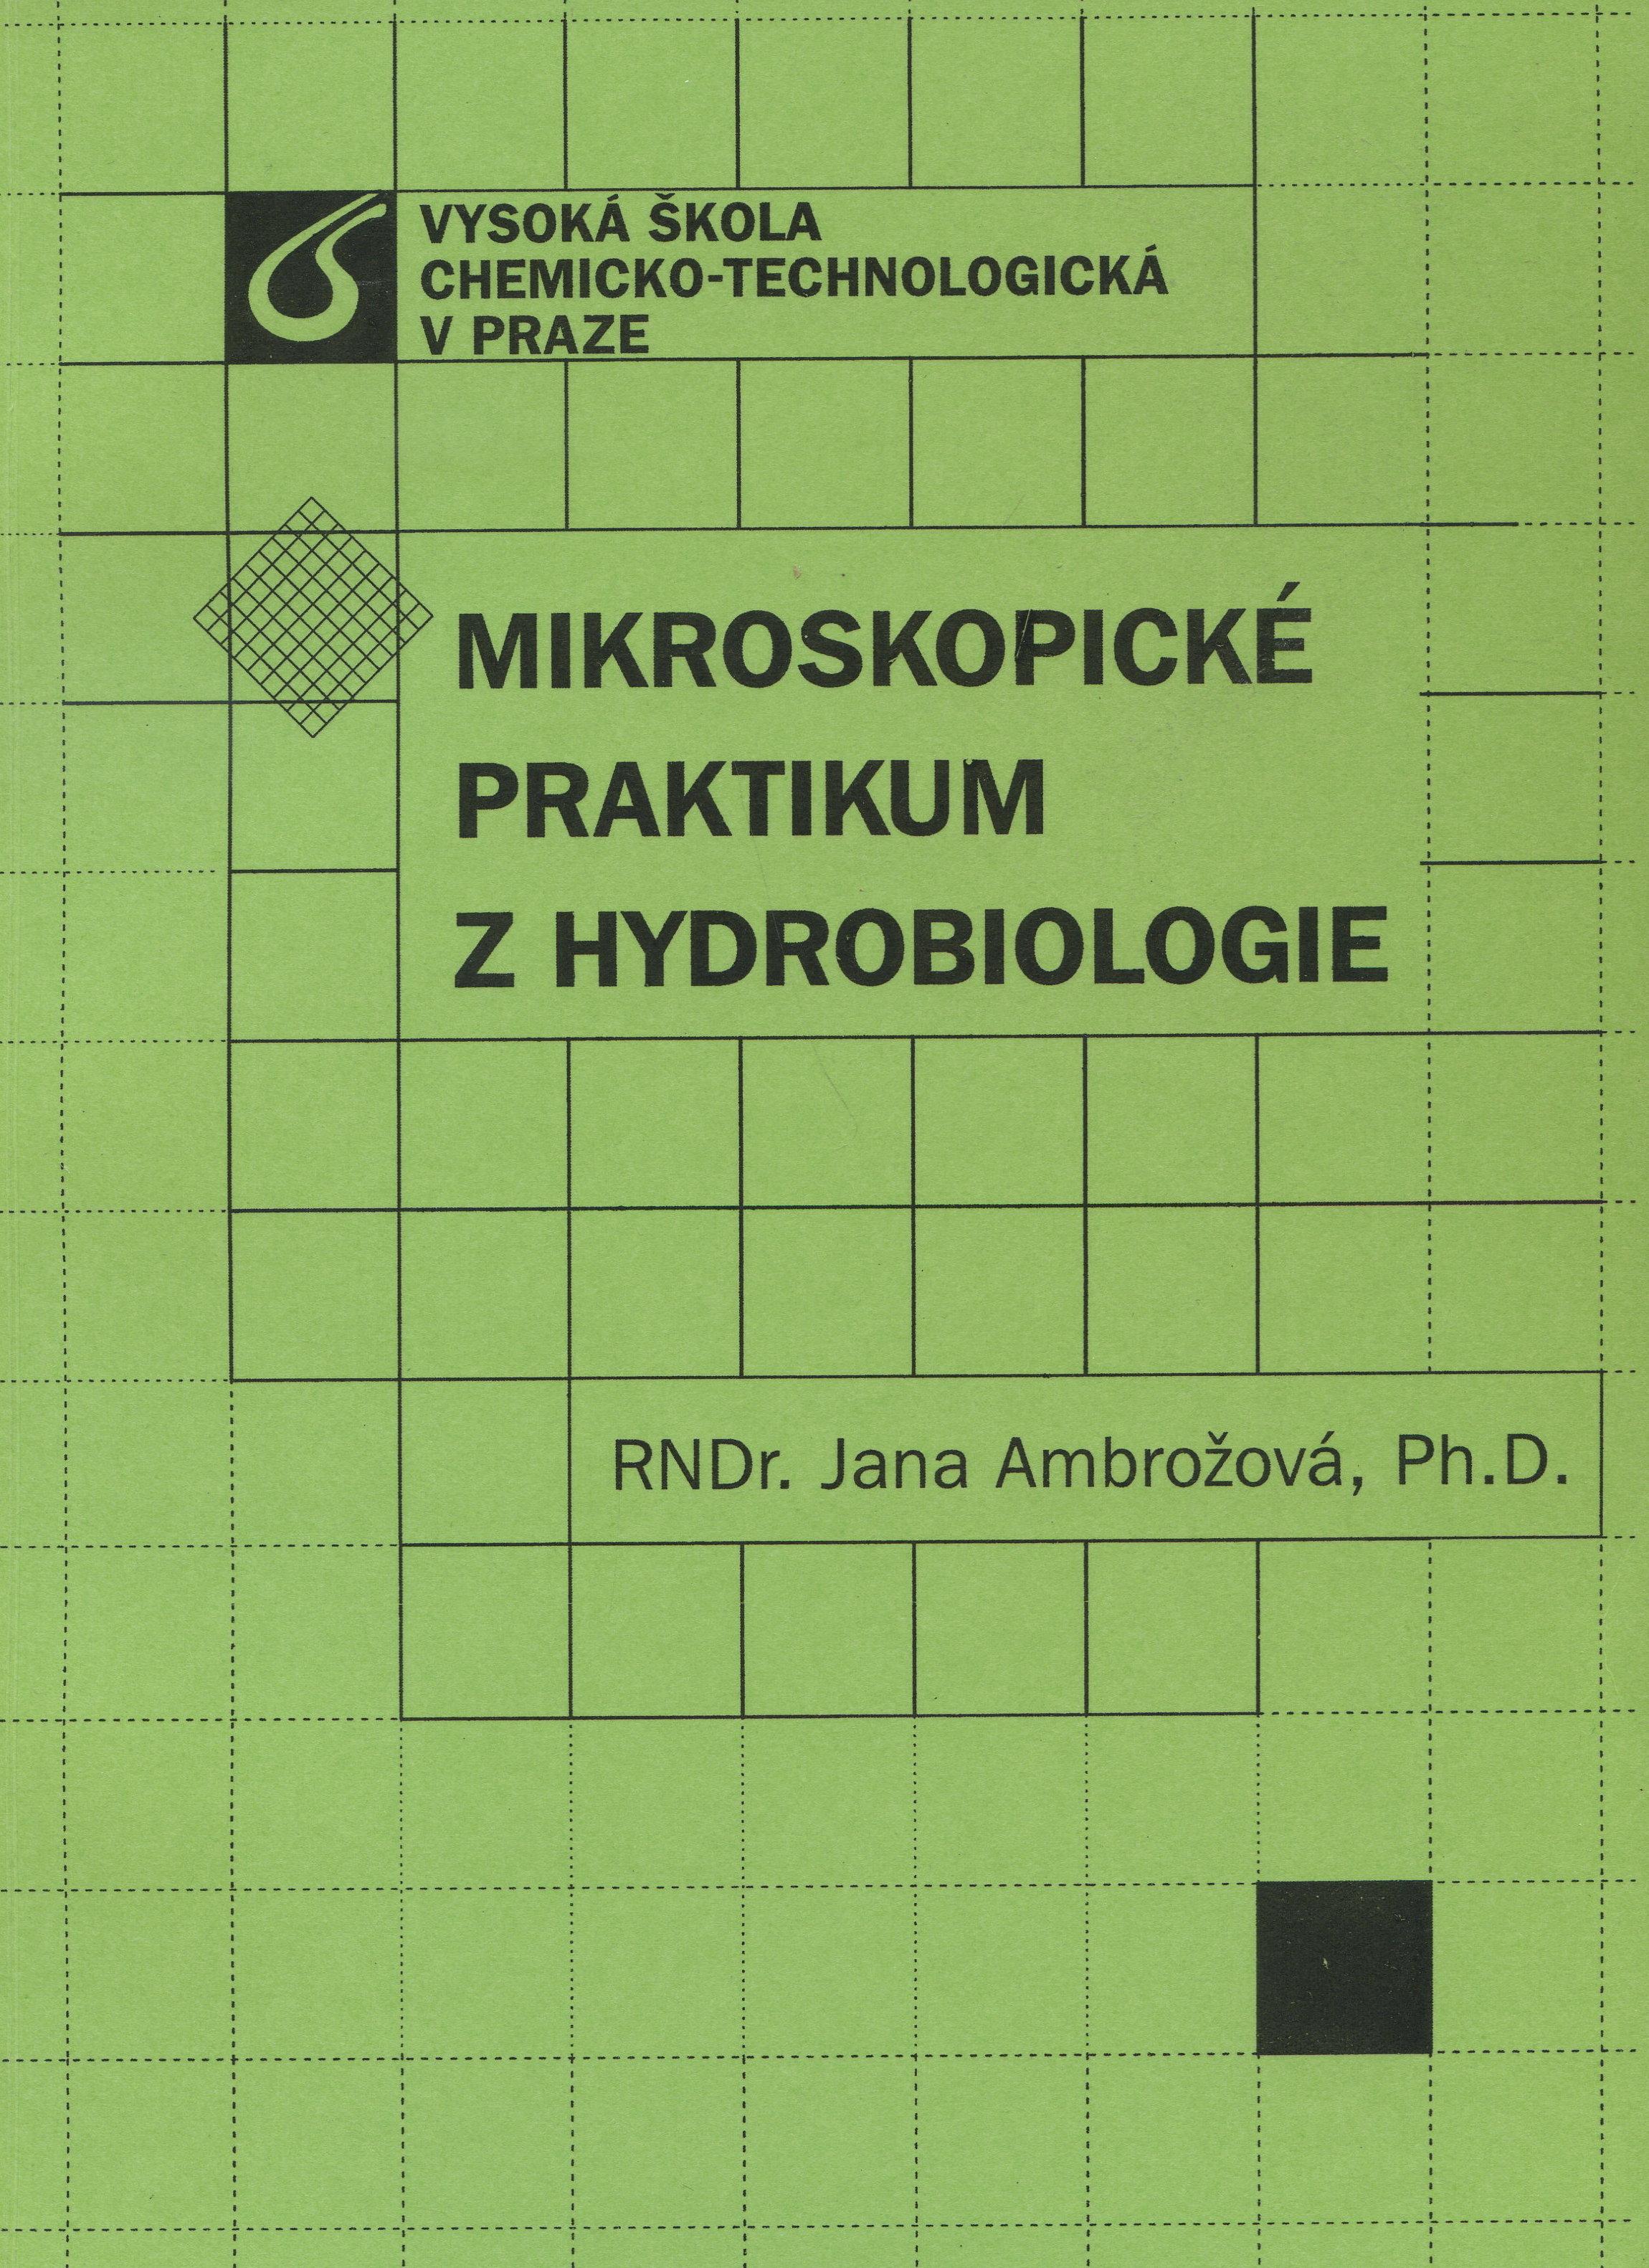 Mikroskopické praktikum z hydrobiologie